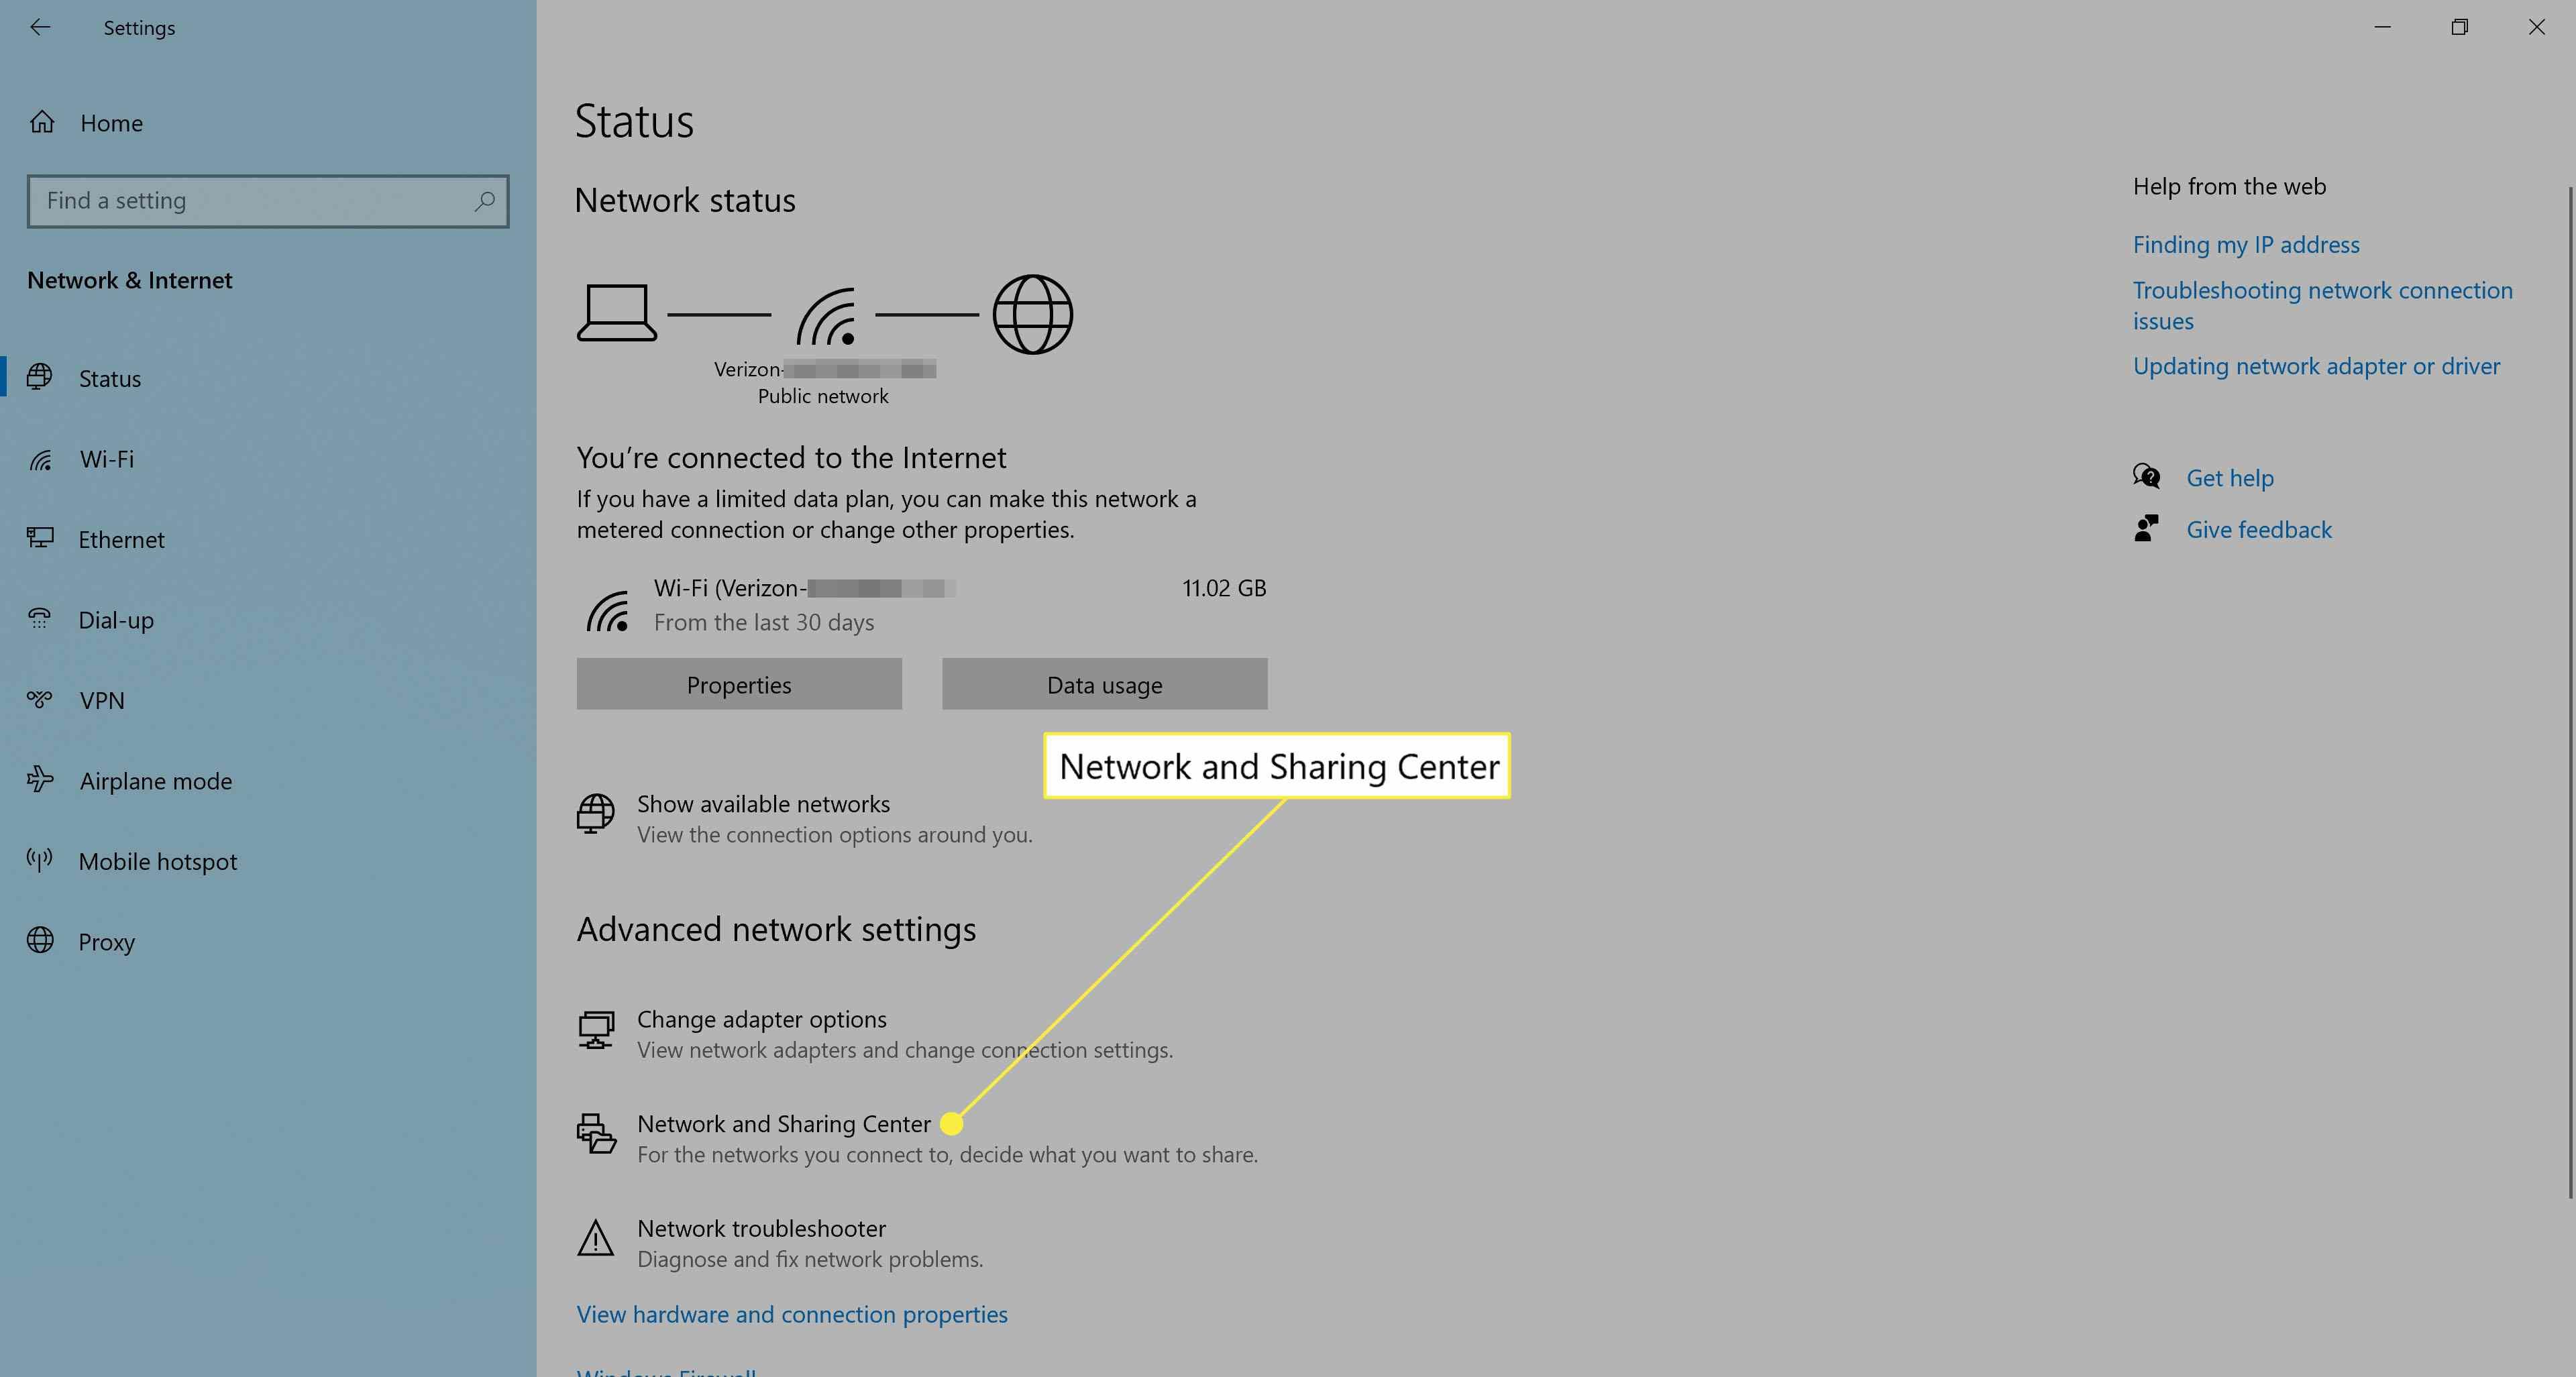 Network settings in Windows 10.